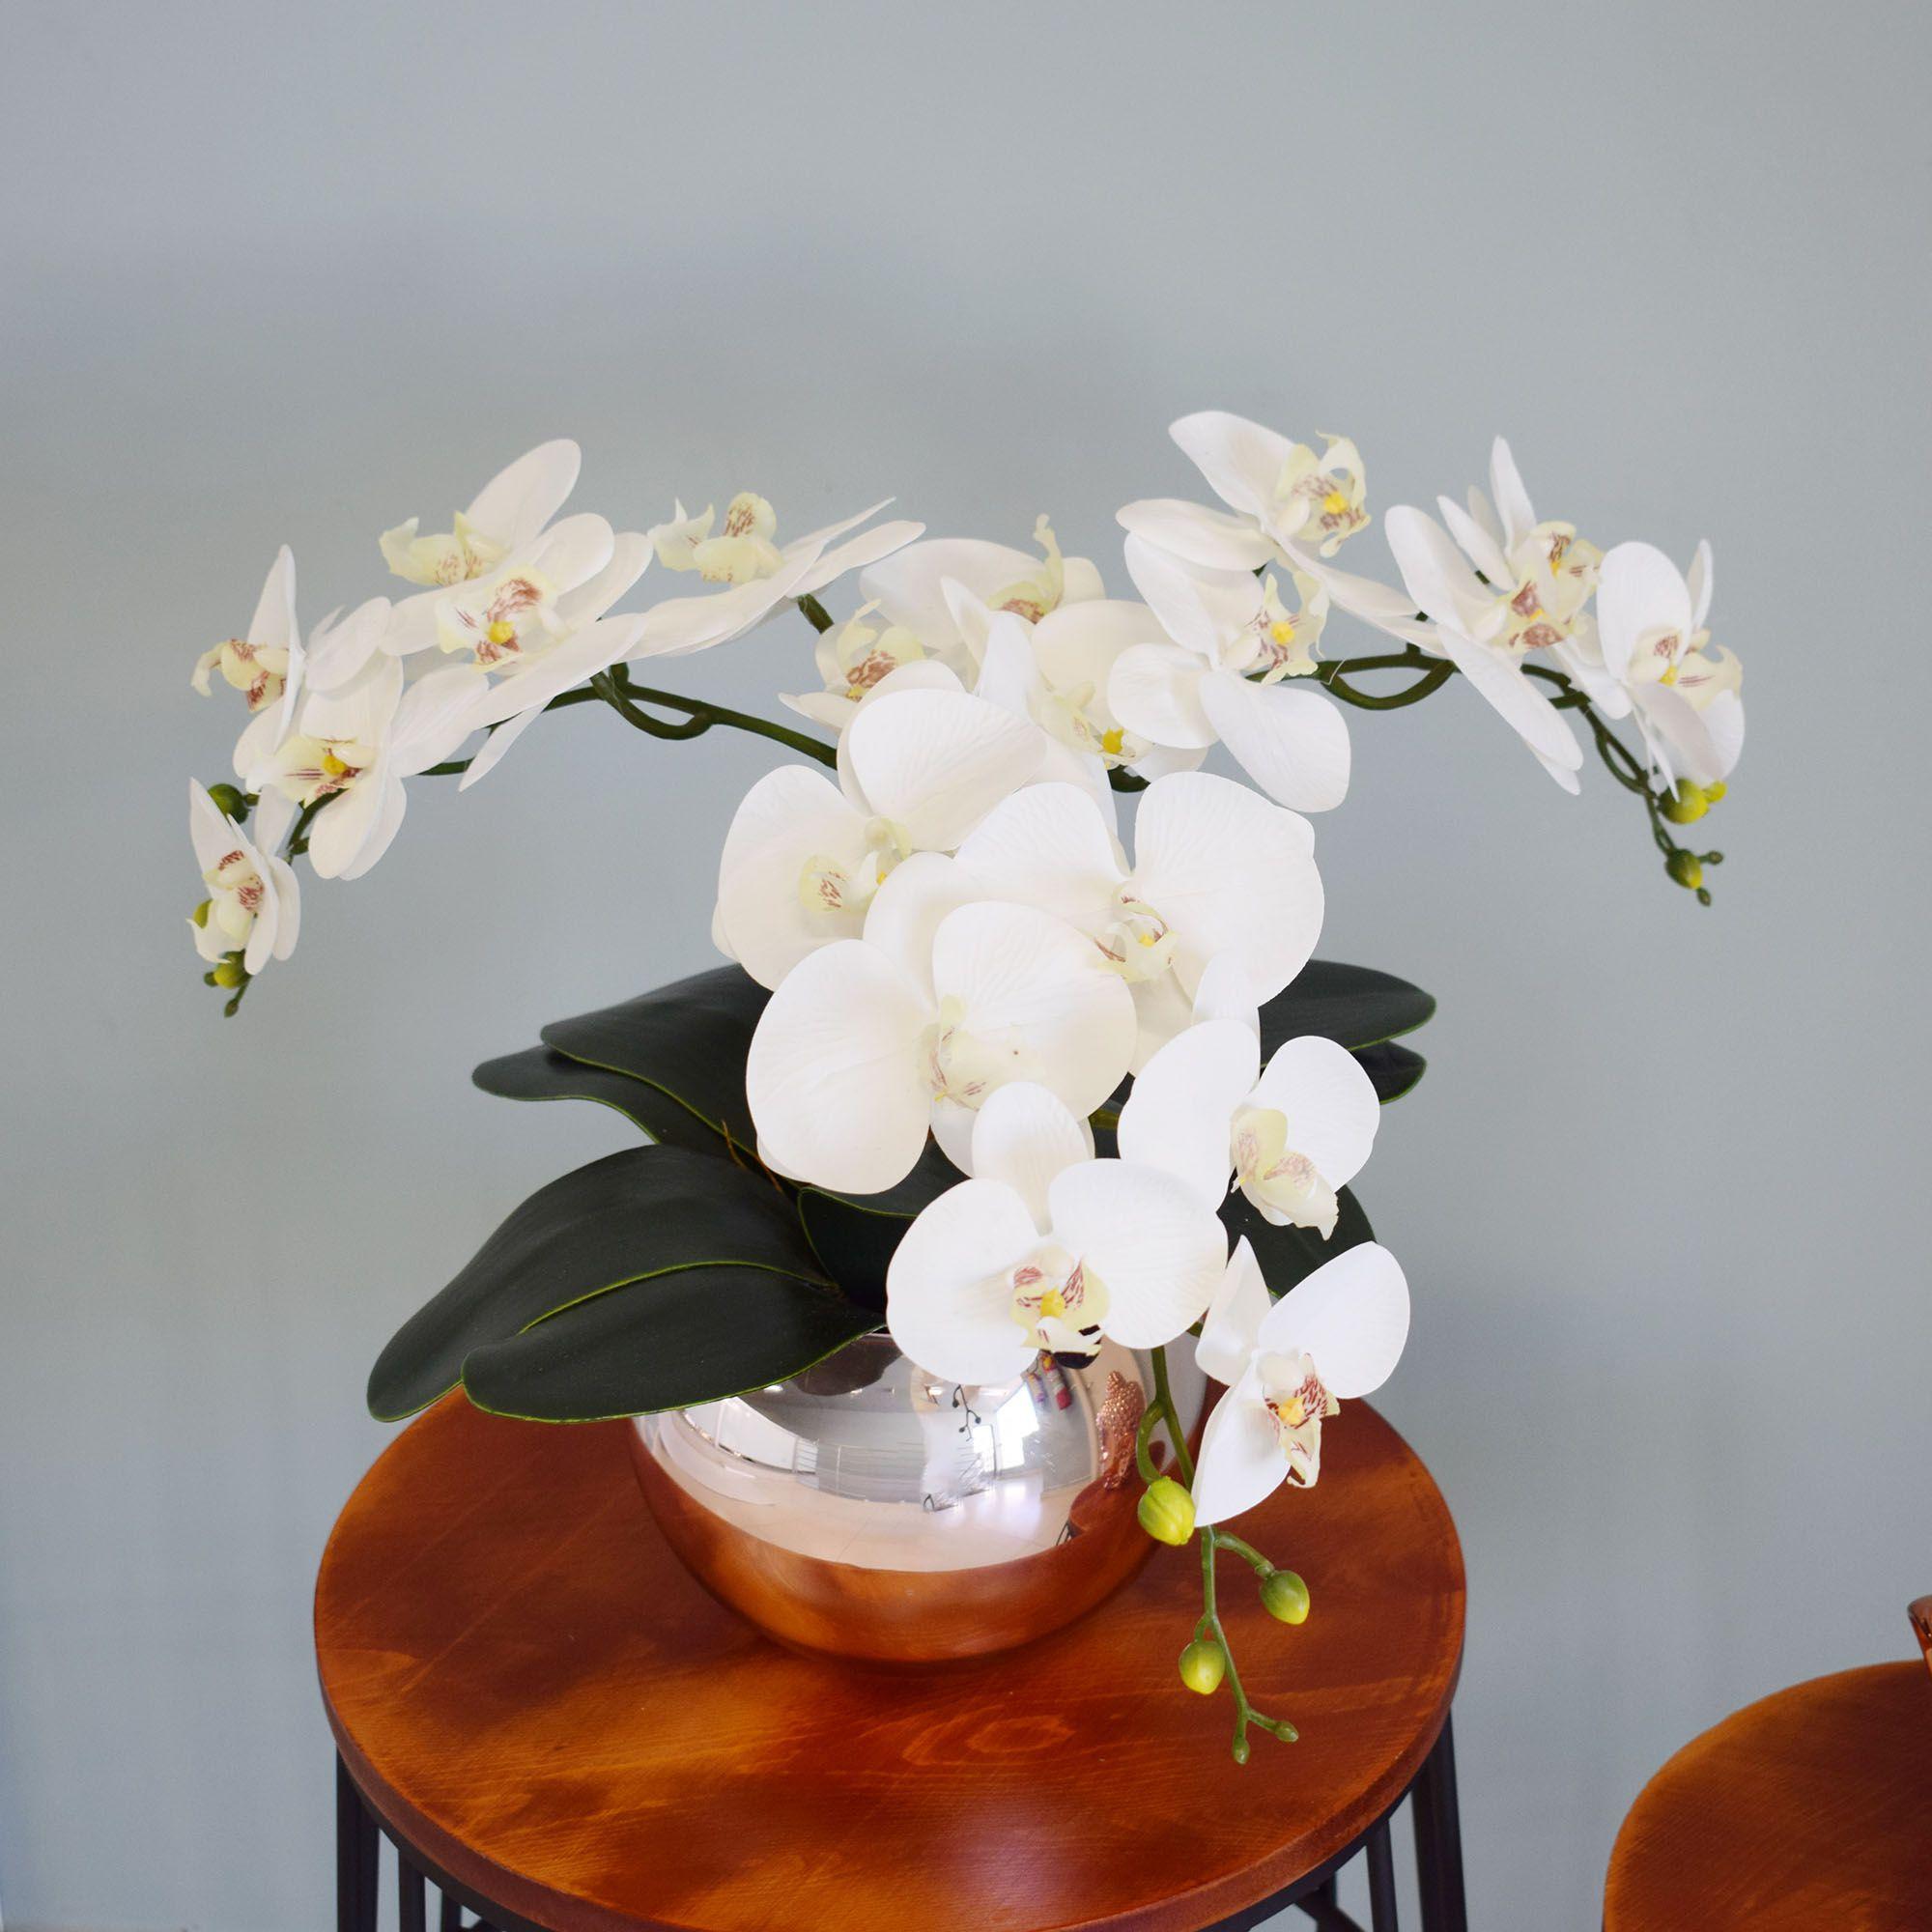 Flores artificiais Arranjo de Orquídeas Branco no Vaso Rose Gold